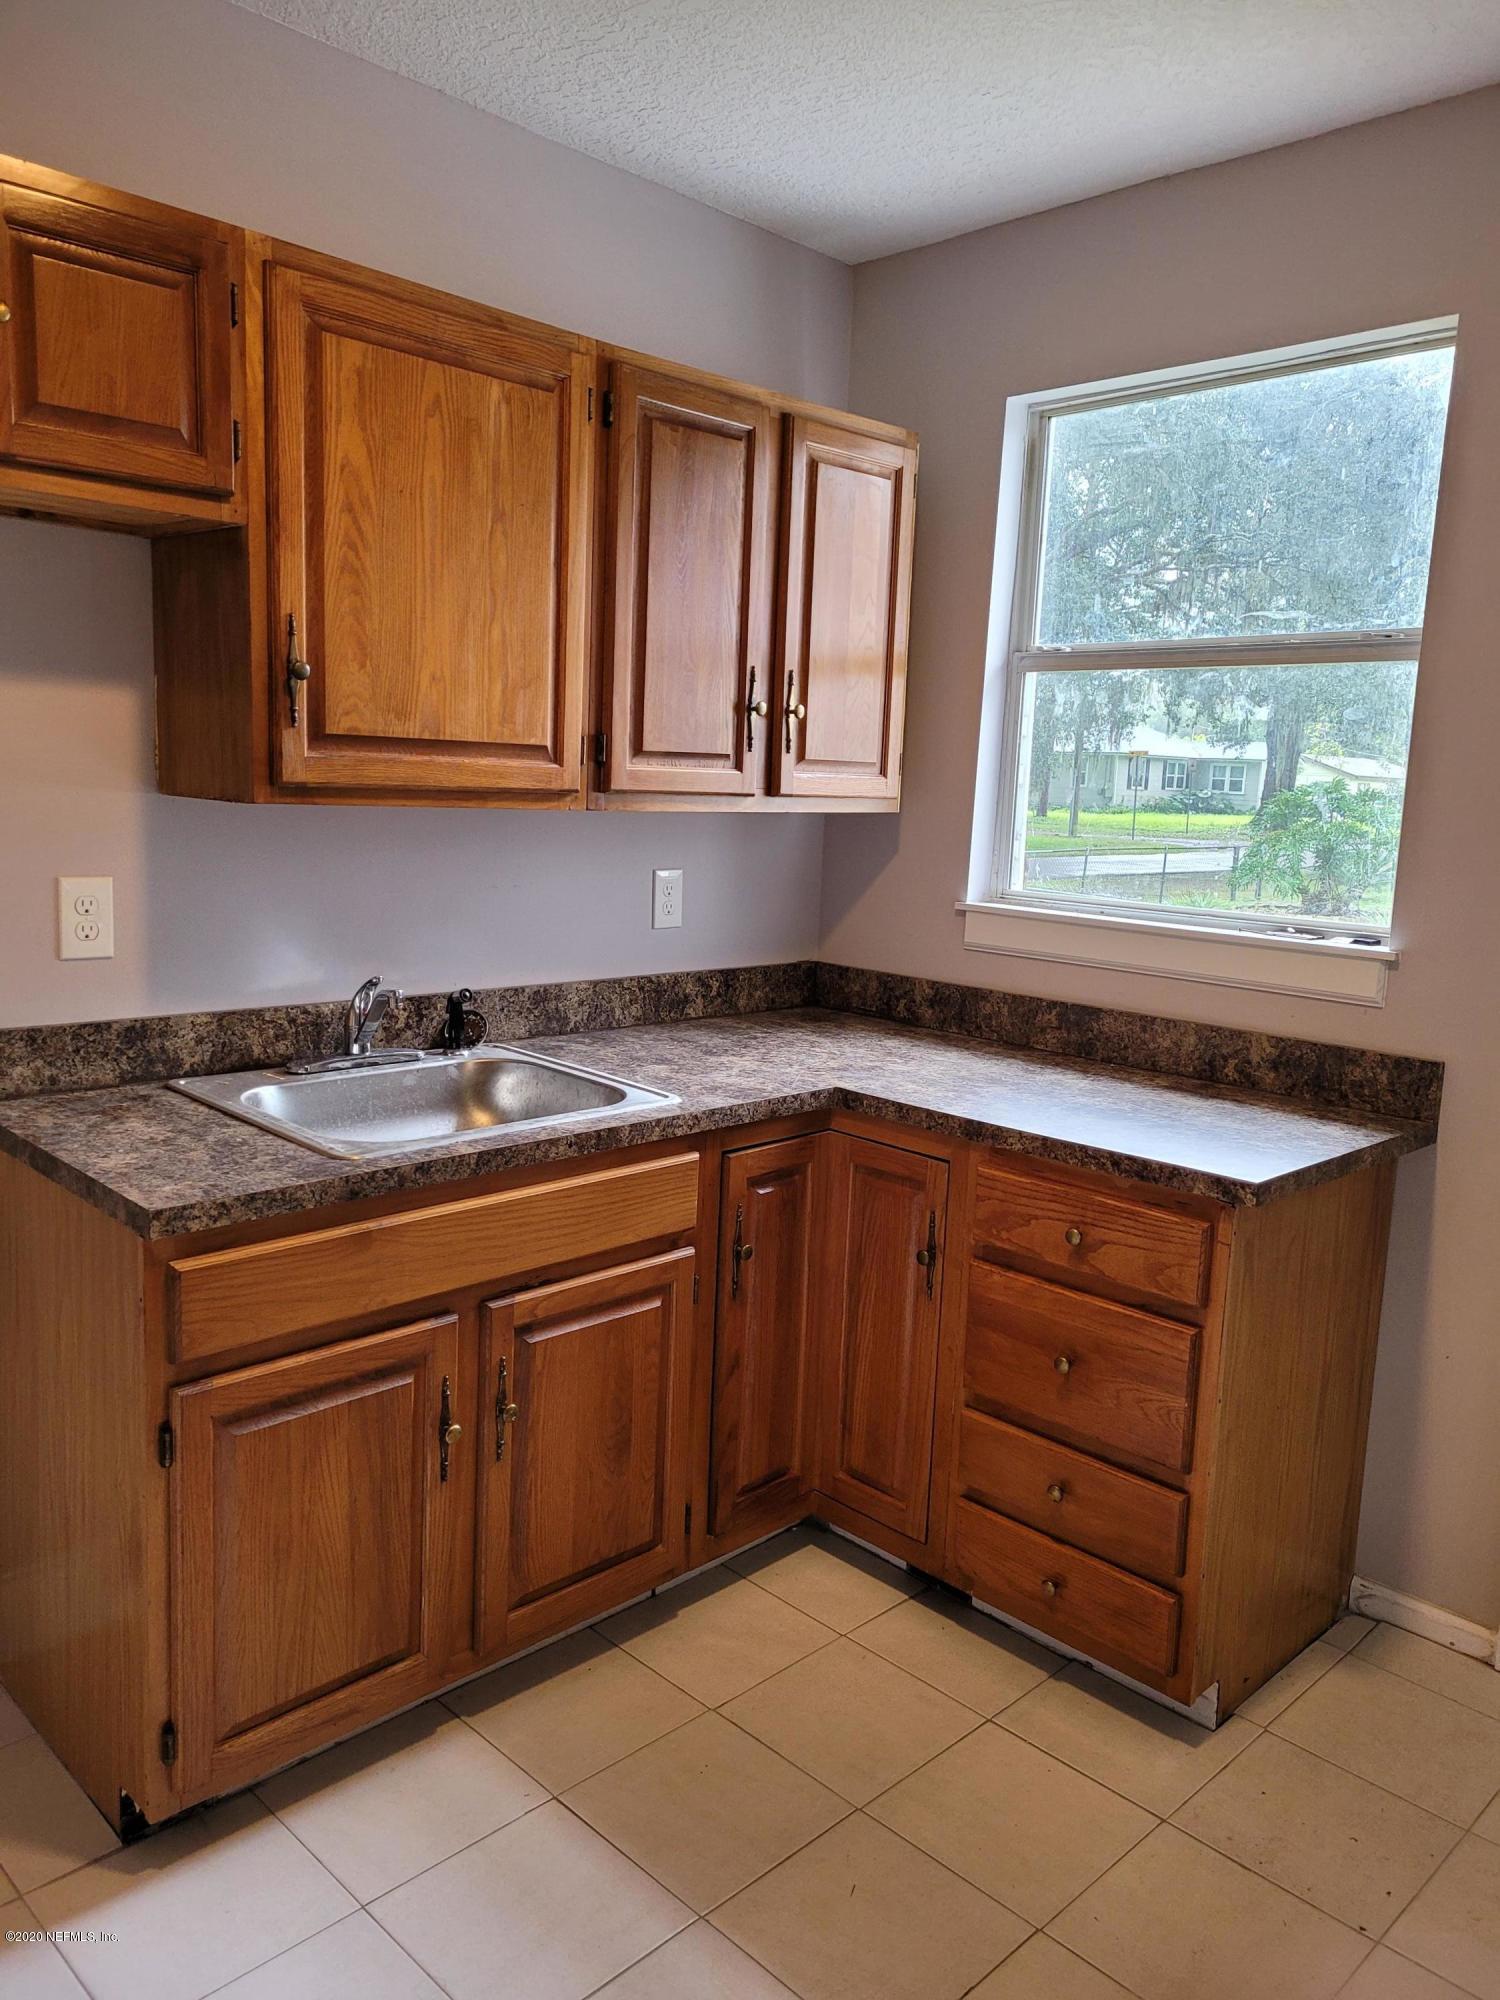 9004 POLK, JACKSONVILLE, FLORIDA 32208, 3 Bedrooms Bedrooms, ,1 BathroomBathrooms,Residential,For sale,POLK,1083360